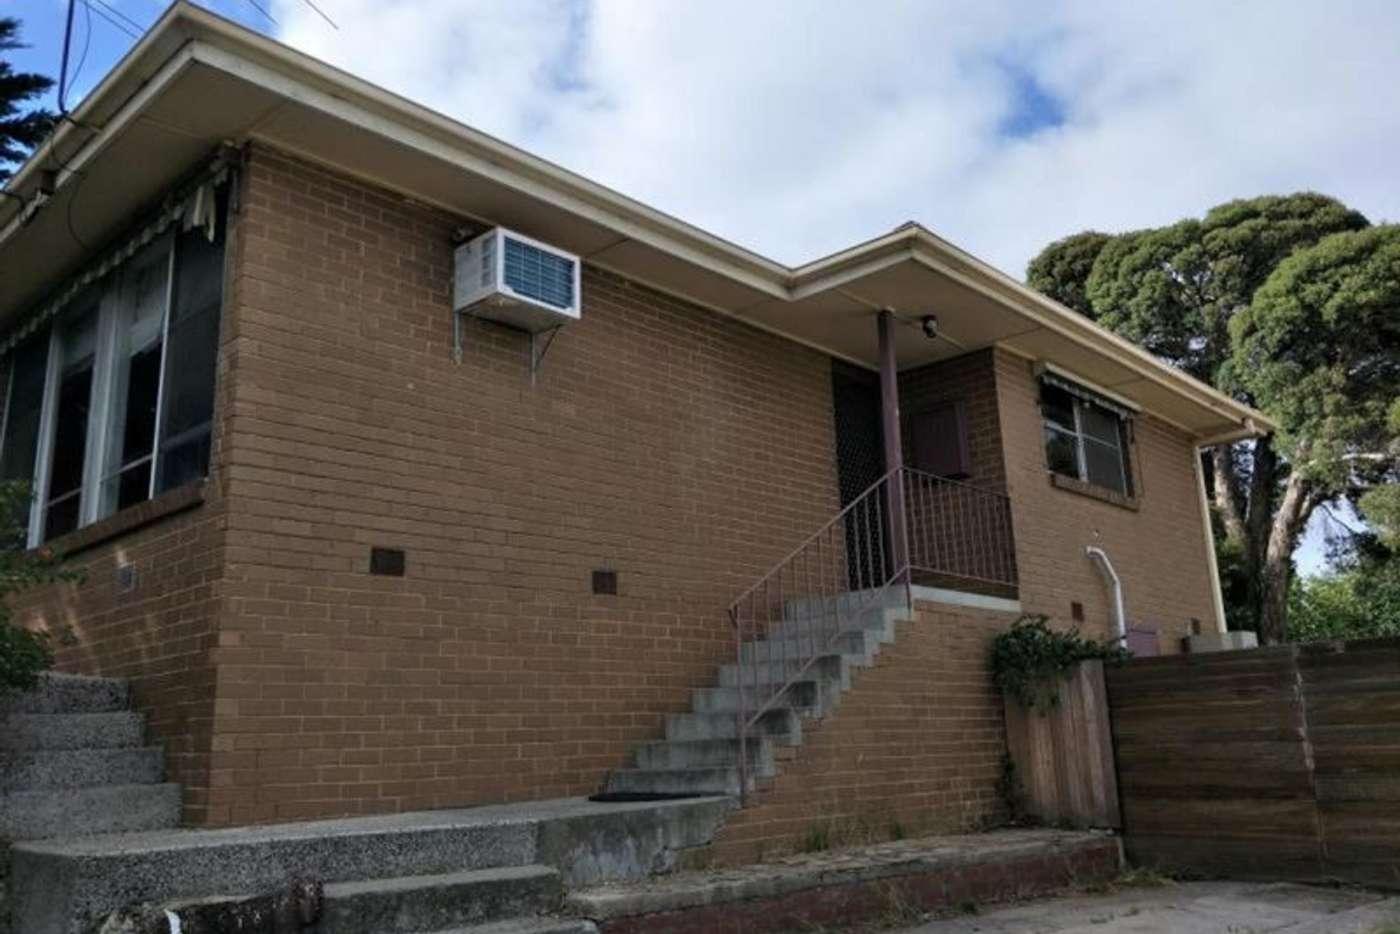 Main view of Homely house listing, 13 Hendricks Crescent, Jacana VIC 3047